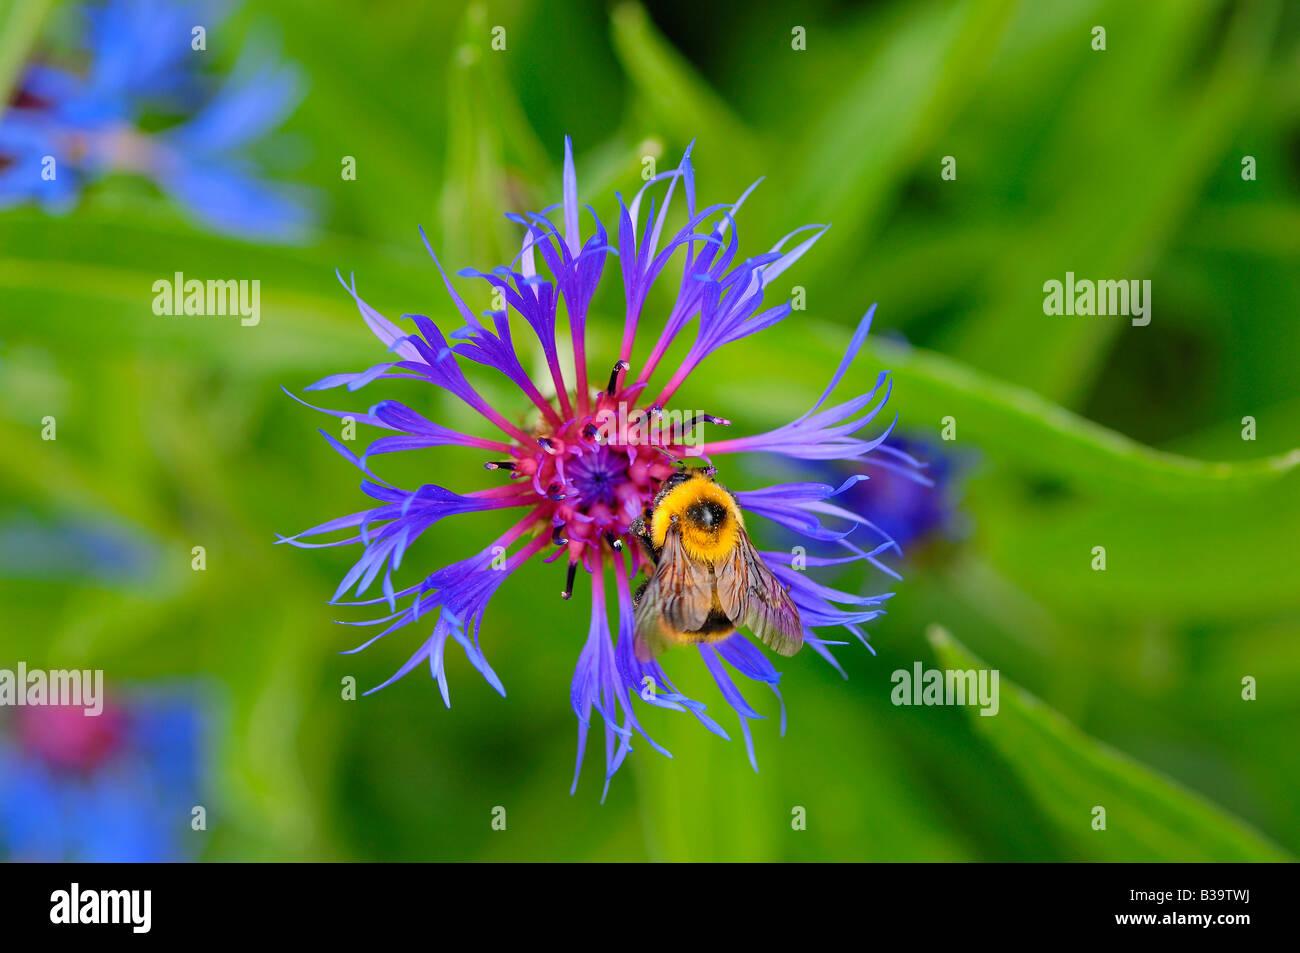 Bee on a purple flower at Manito Park, Spokane, Washington State, USA Stock Photo